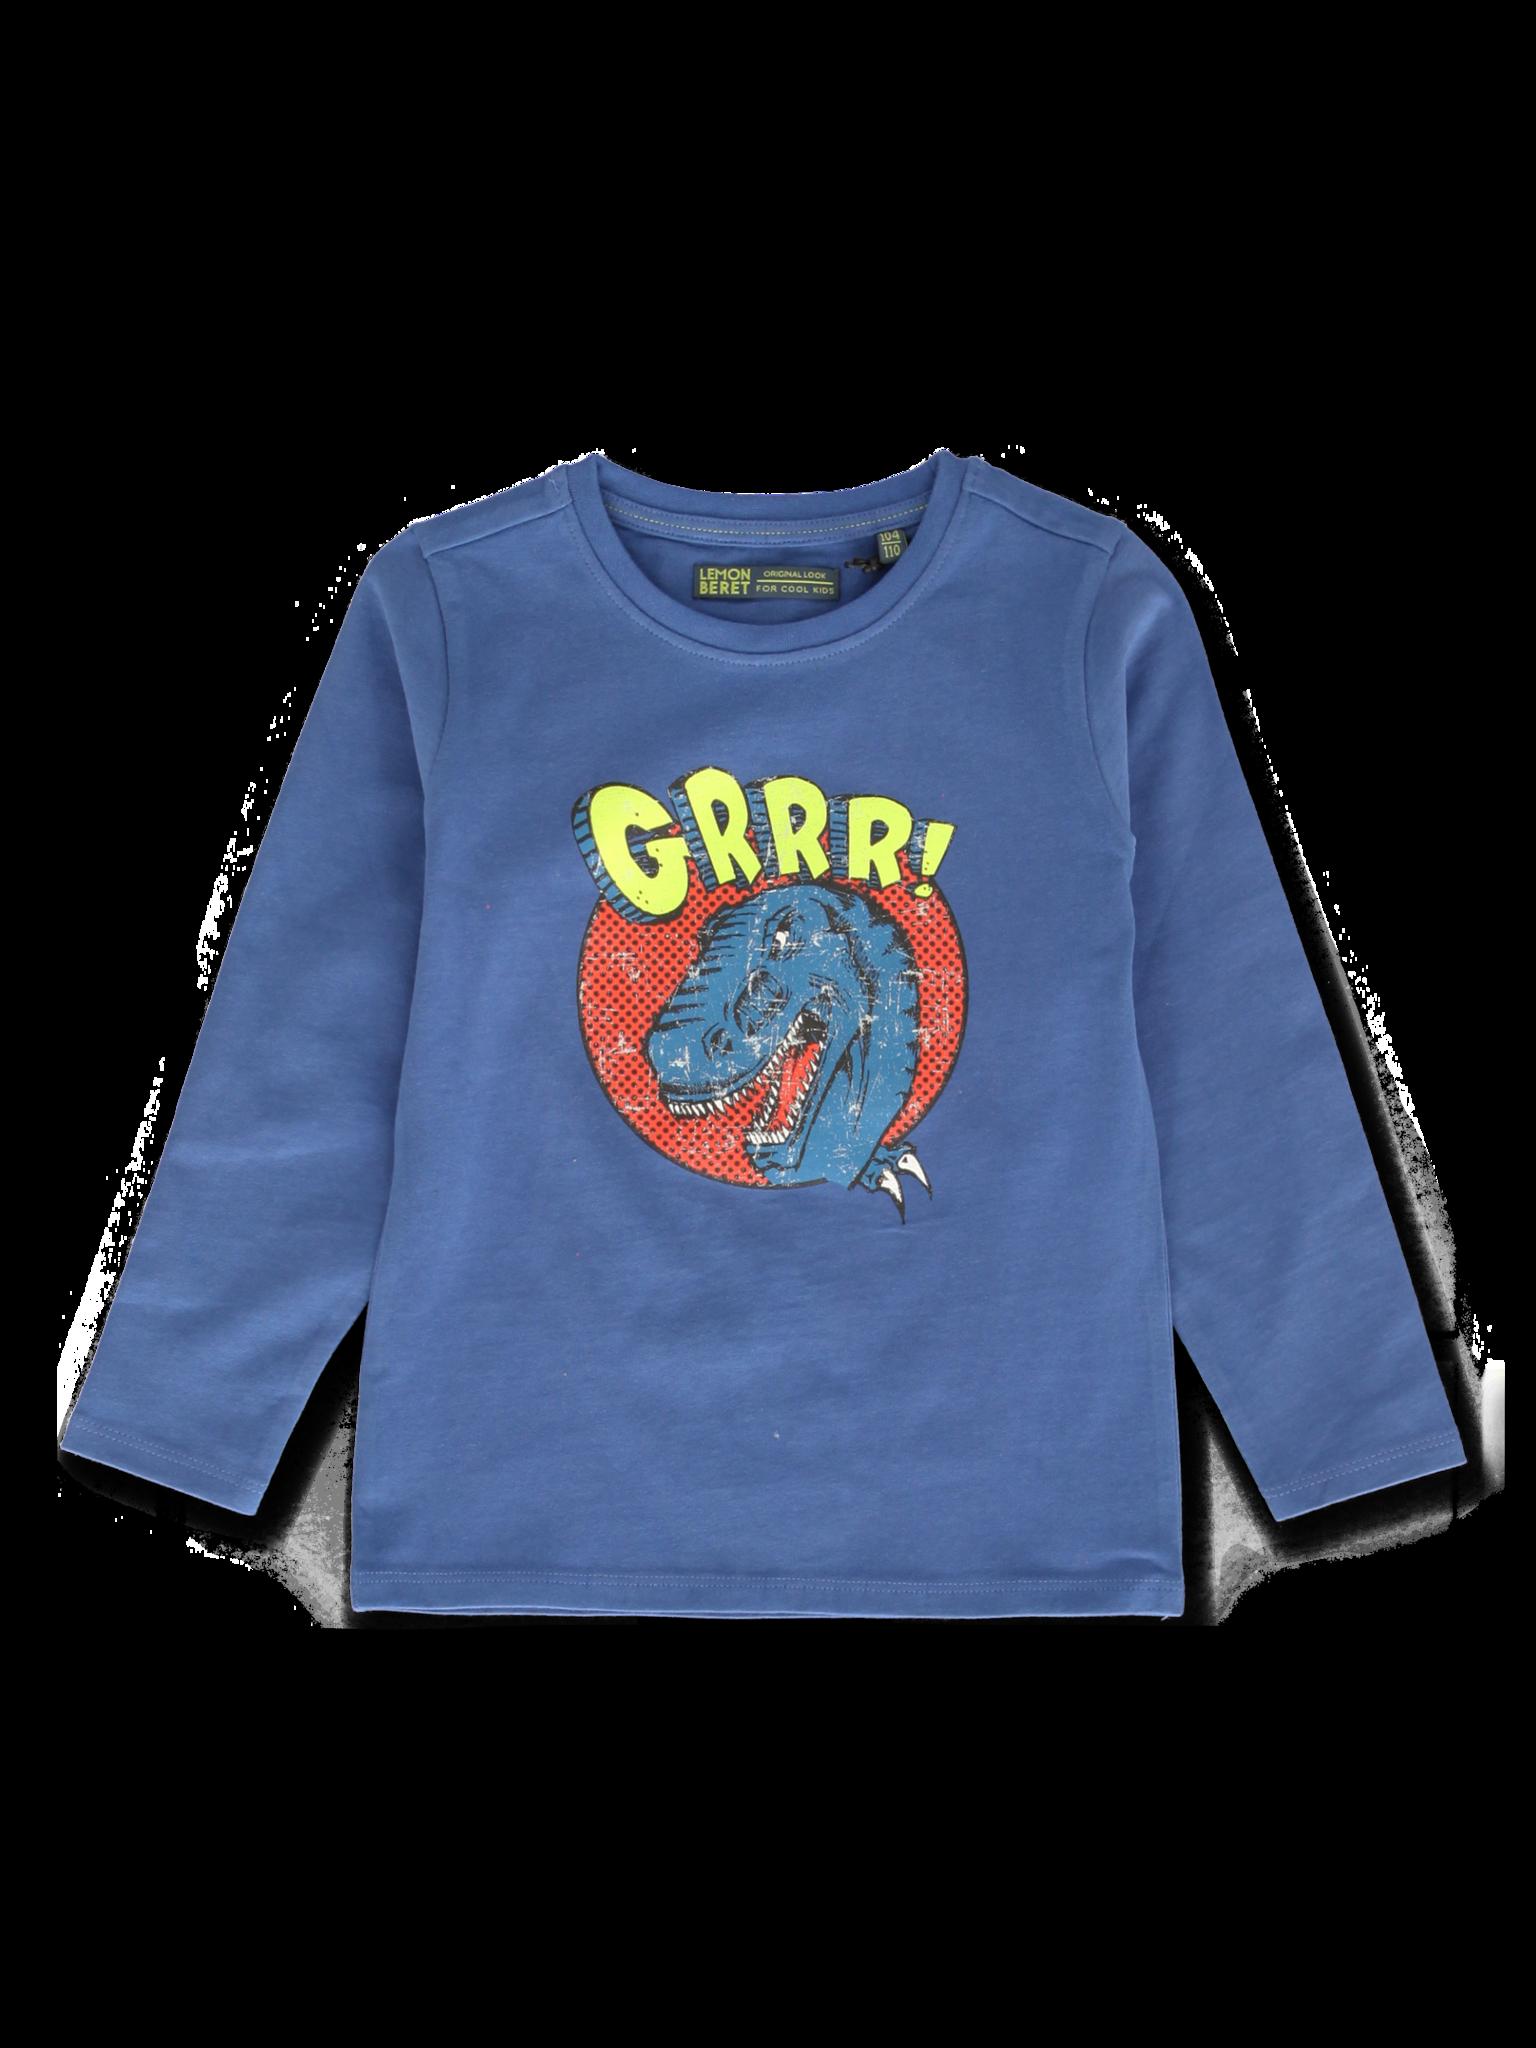 All Brands | Winterproducts Small Boys | T-shirt | 12 pcs/box